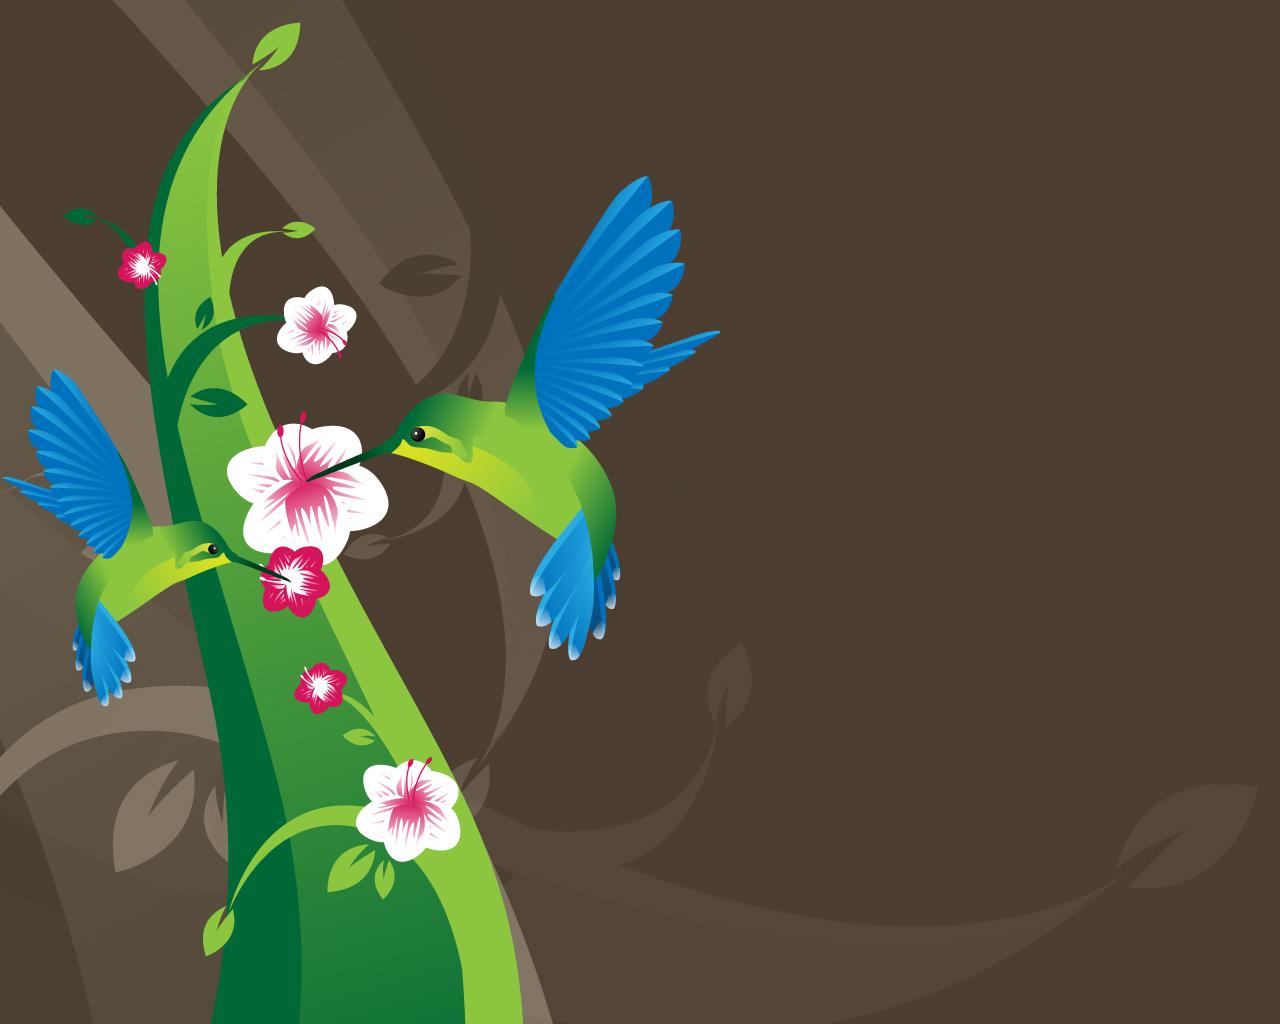 Hummingbird Wallpaper by wisseh 34 Geniş ekran masaüstü resimler